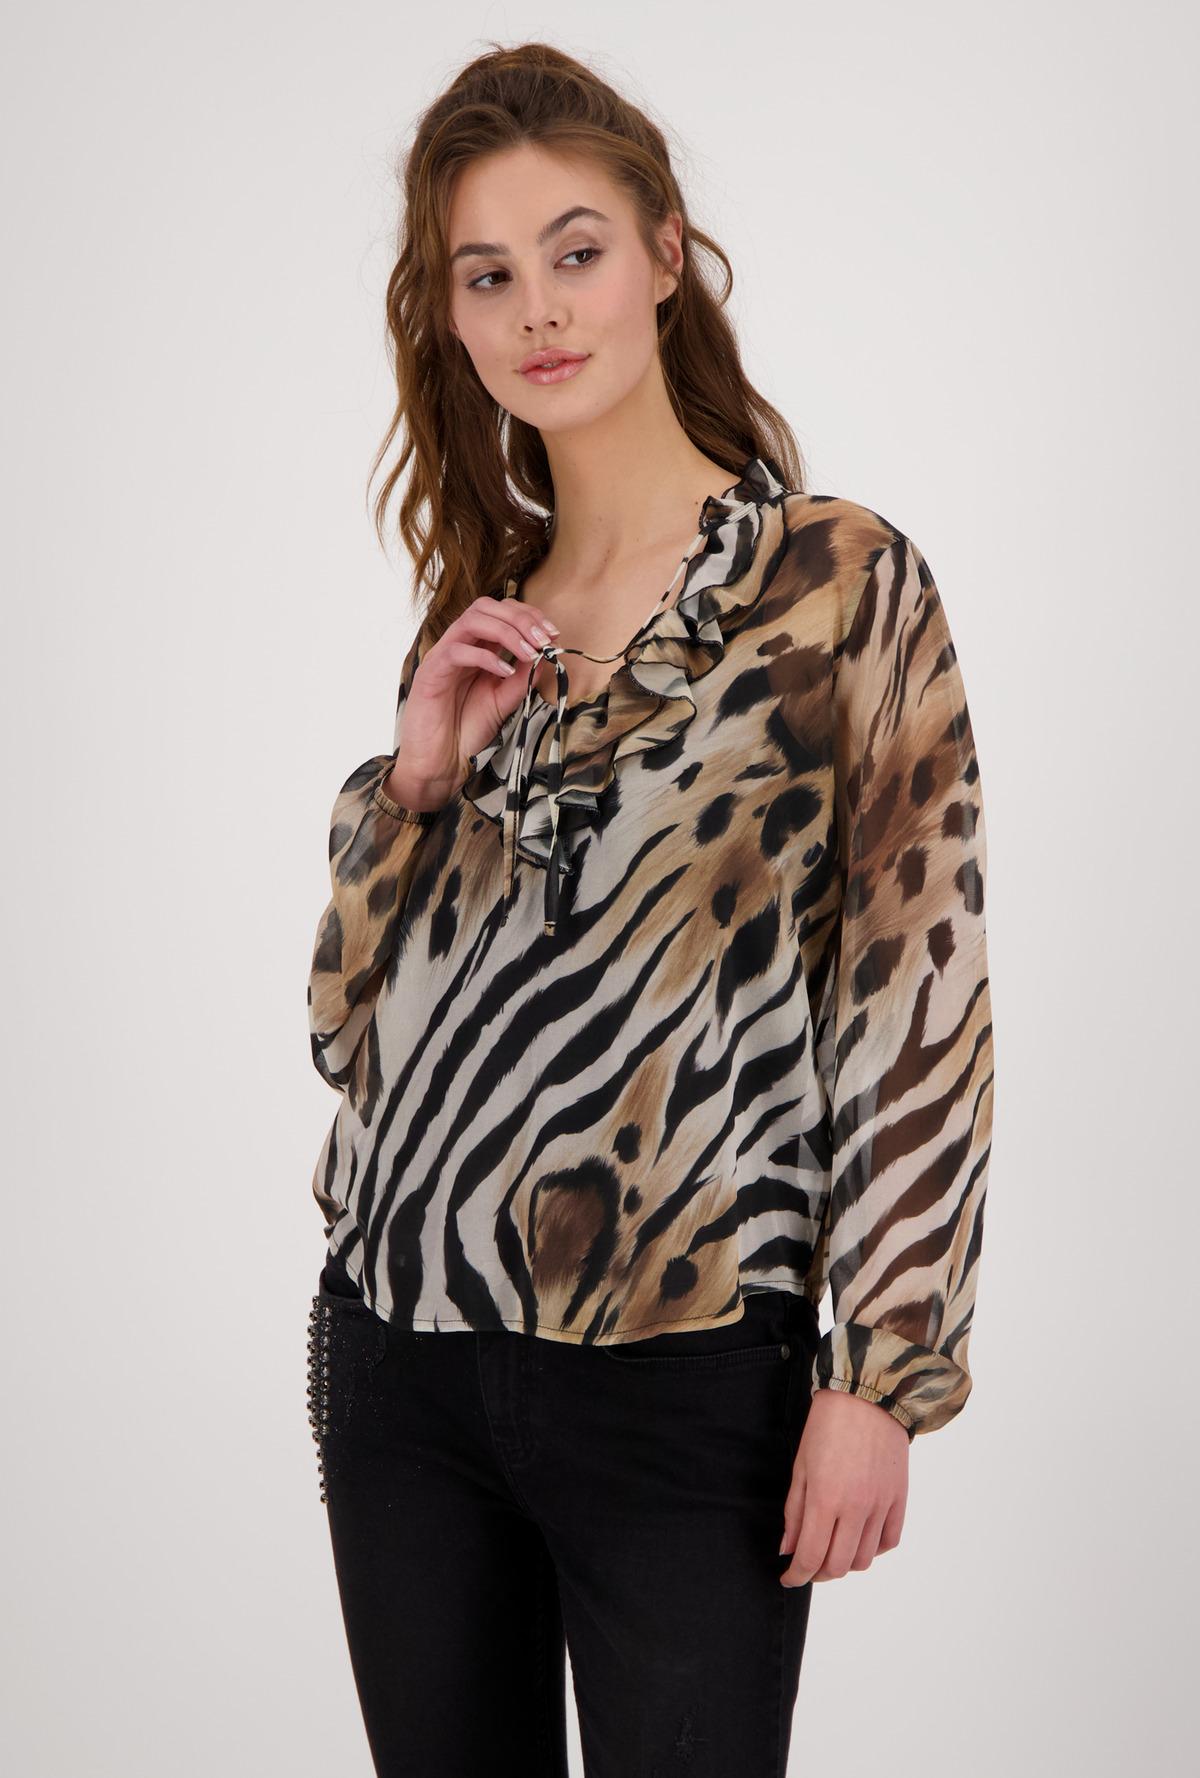 MONARI Animal Print Frill Blouse Style Top